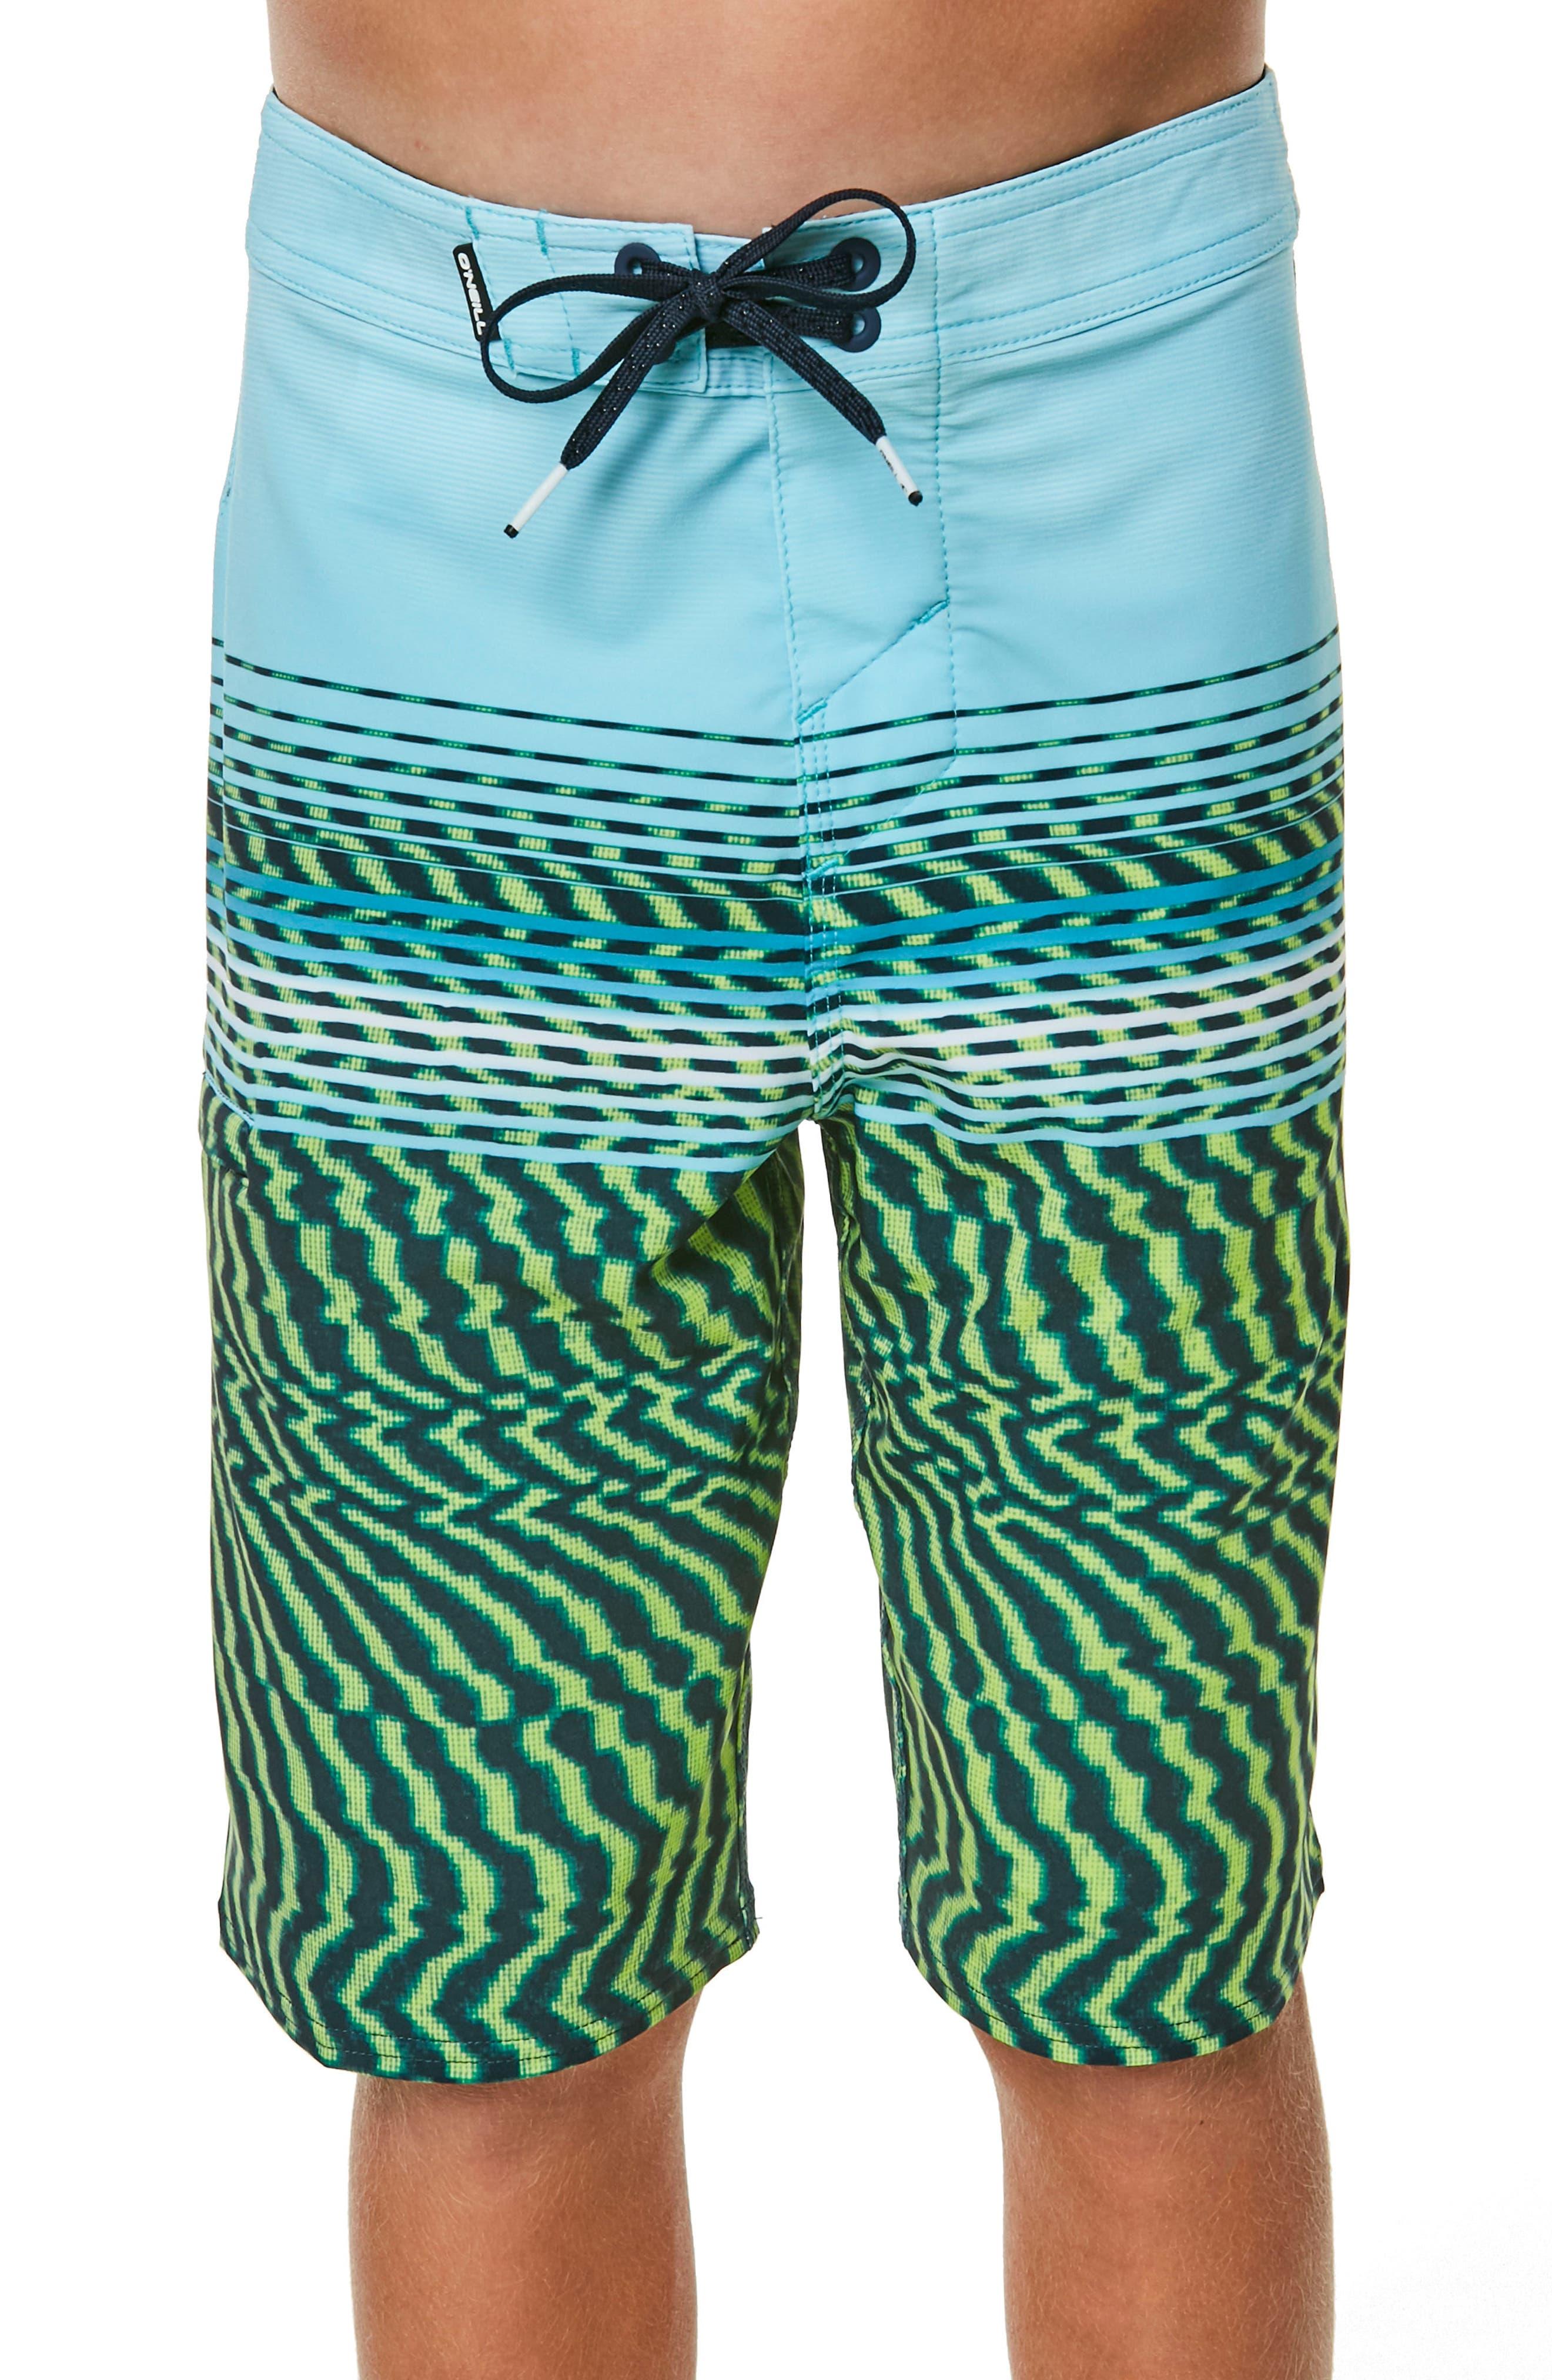 Hyperfreak Wavelength Board Shorts,                             Alternate thumbnail 2, color,                             305